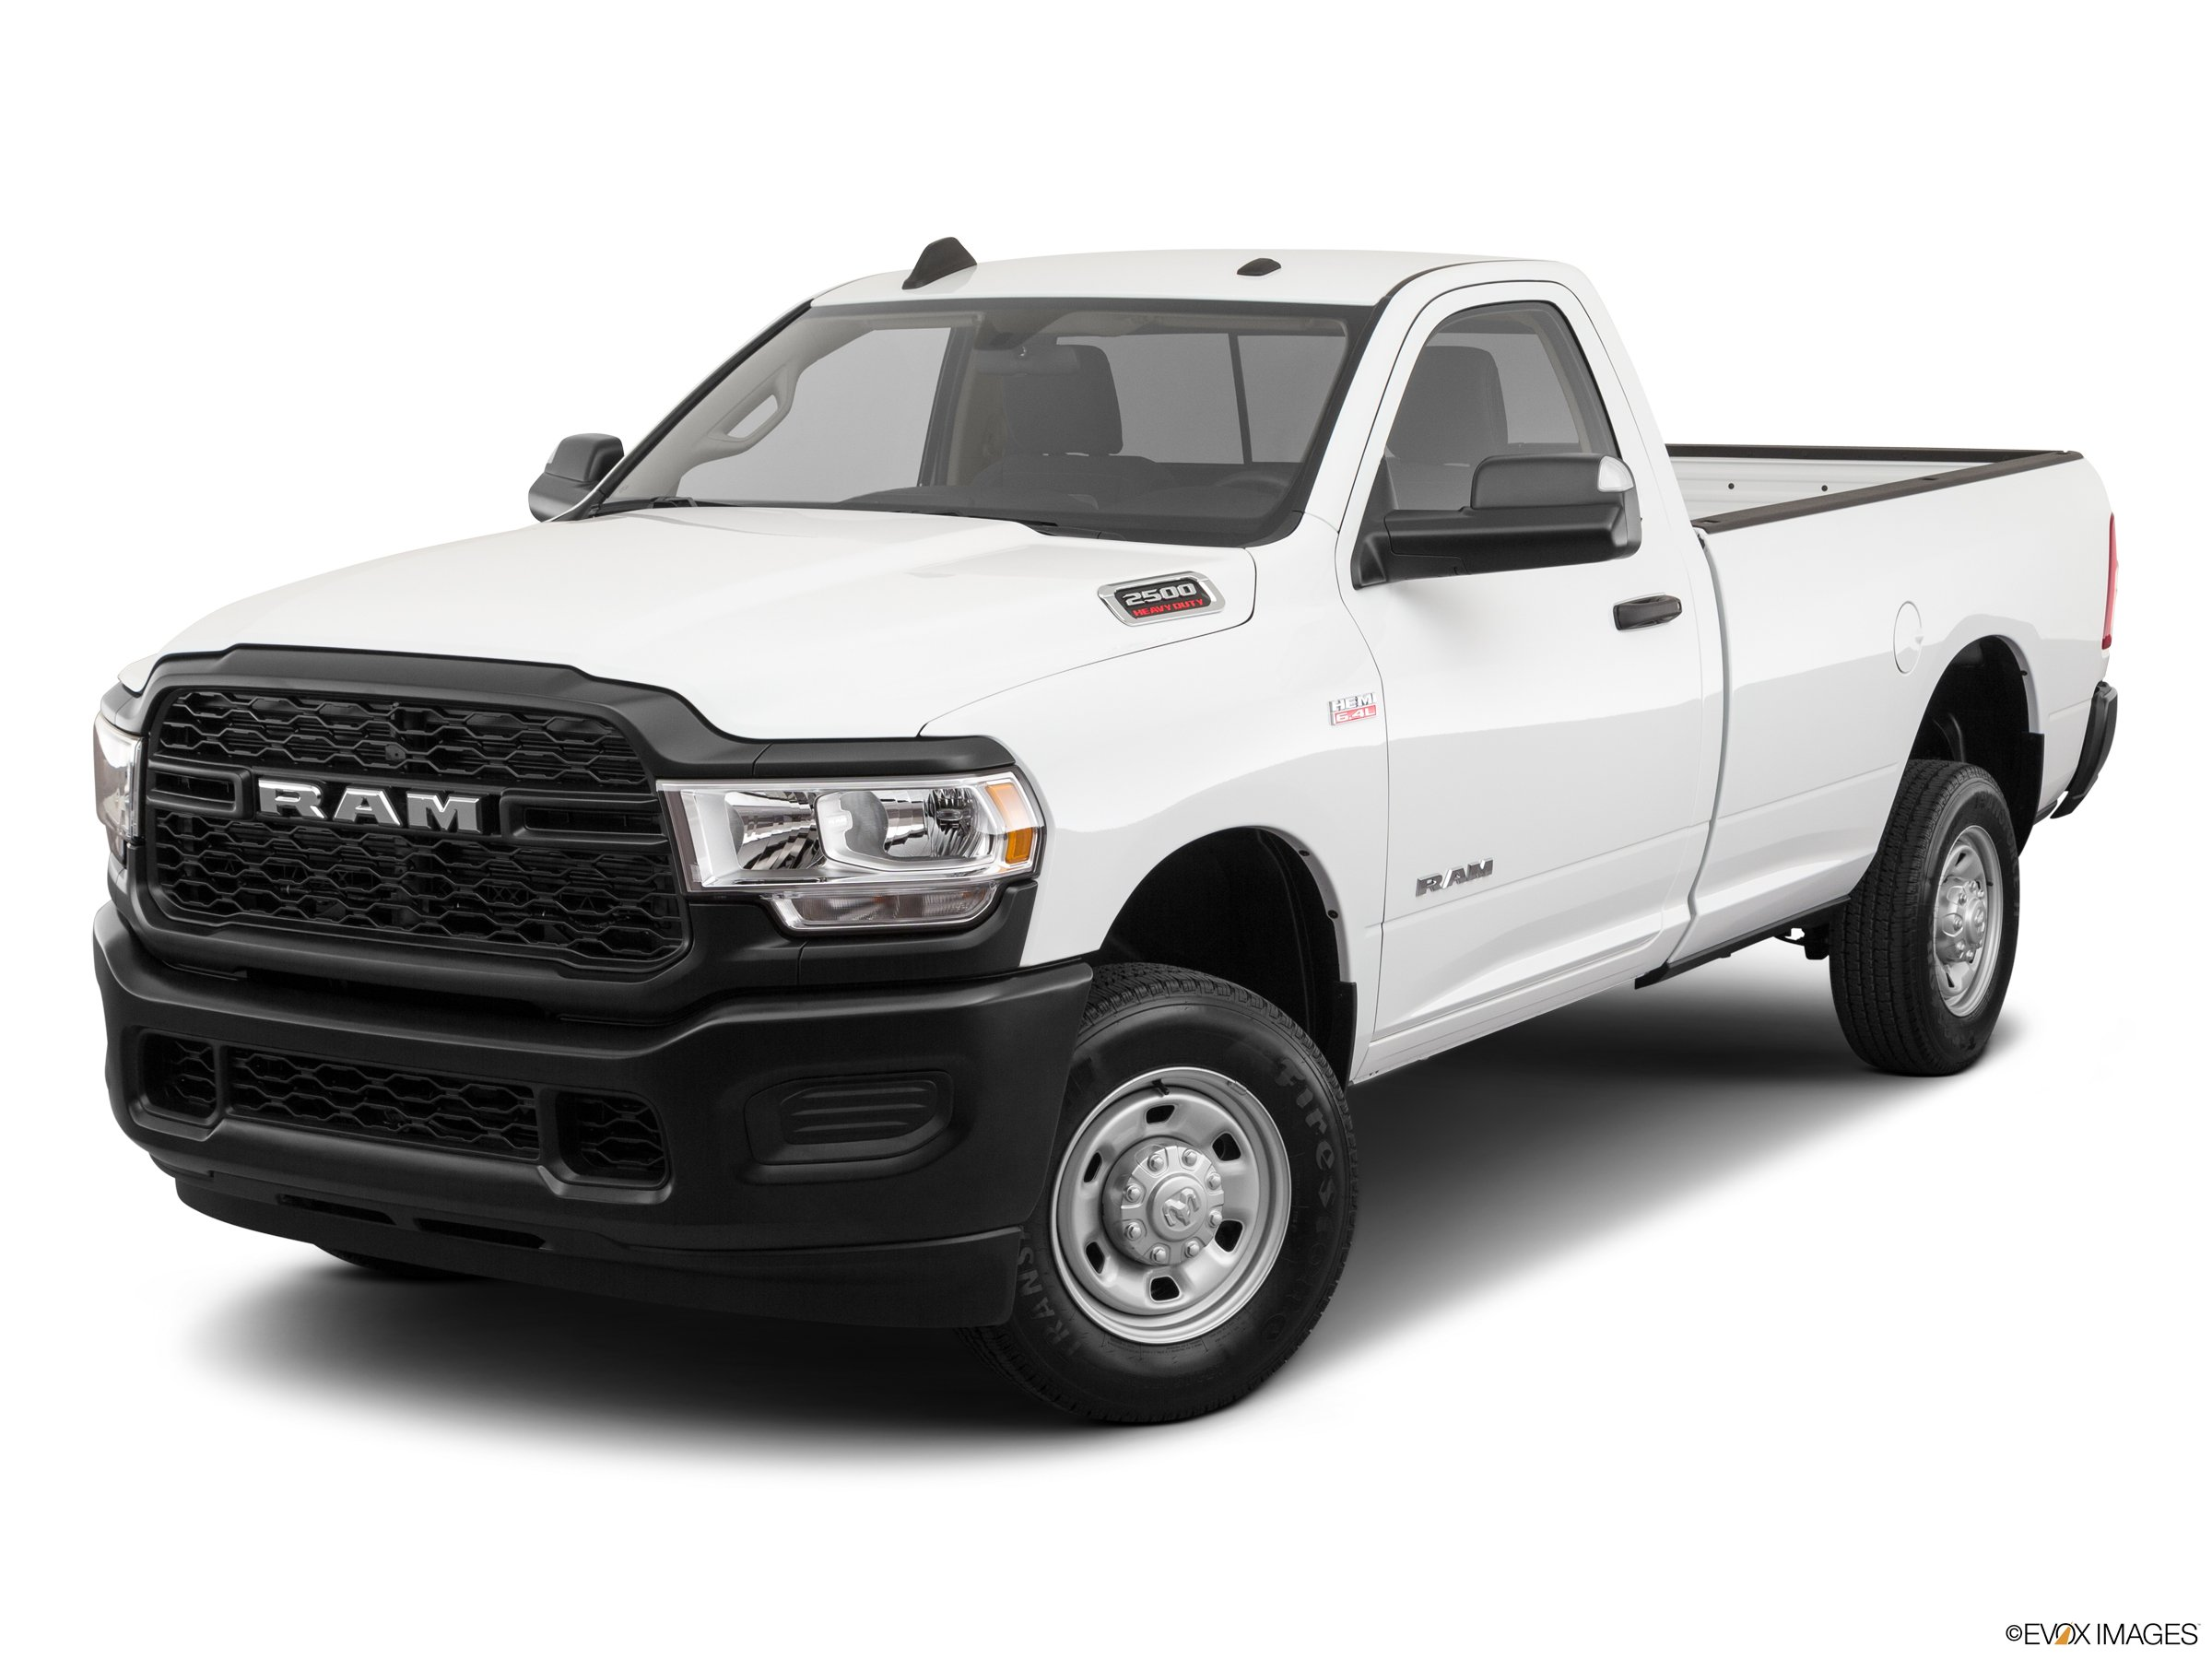 2020 RAM 2500 Tradesman 4×4 pickup